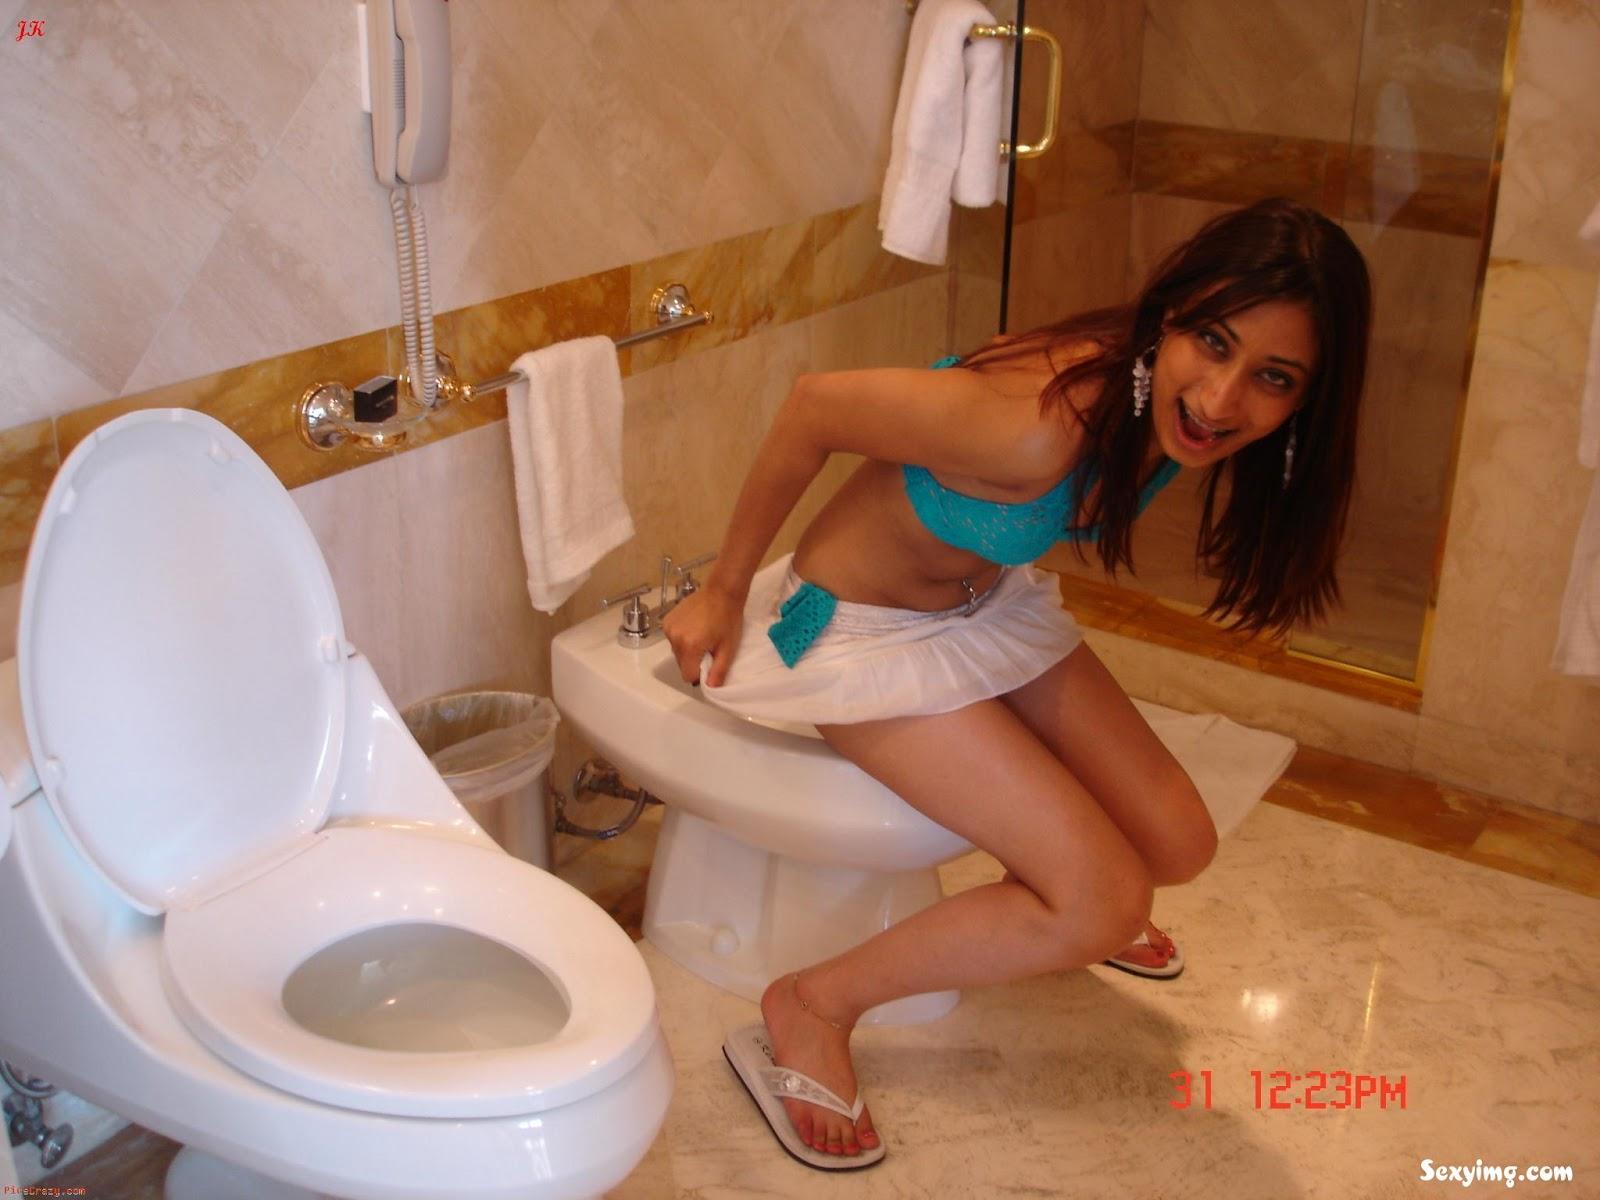 Indian Girl On Toilet